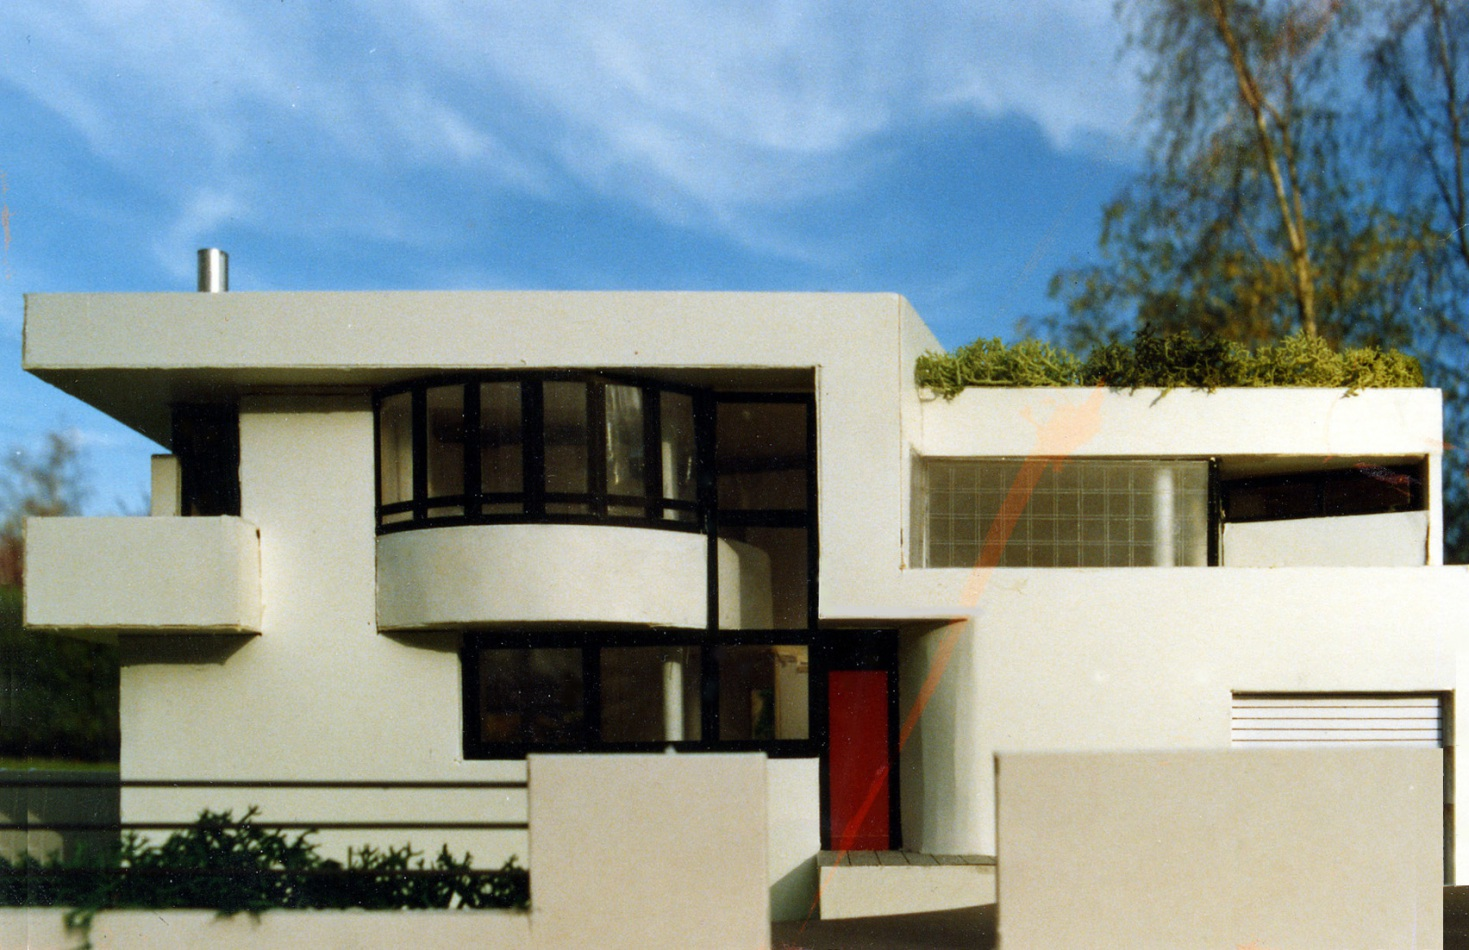 villa pallisco, vitry (val-de-marne) - denis humbert